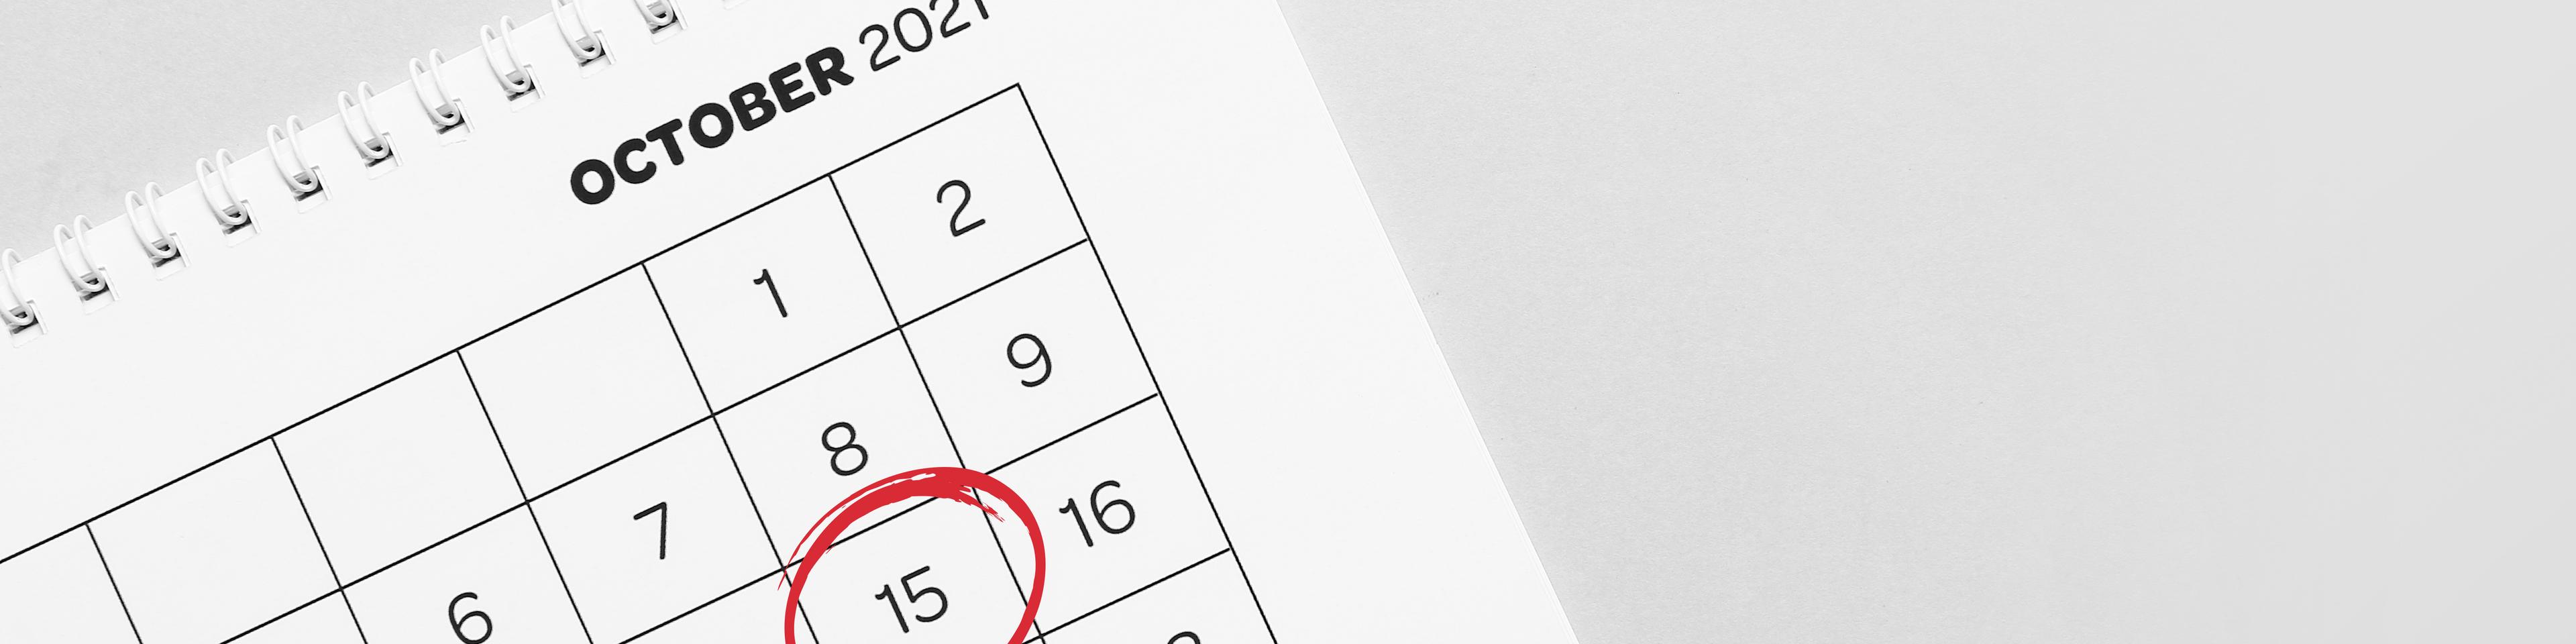 Recharacterizing 2020 IRA regular contributions: October 15 deadline fast approaching